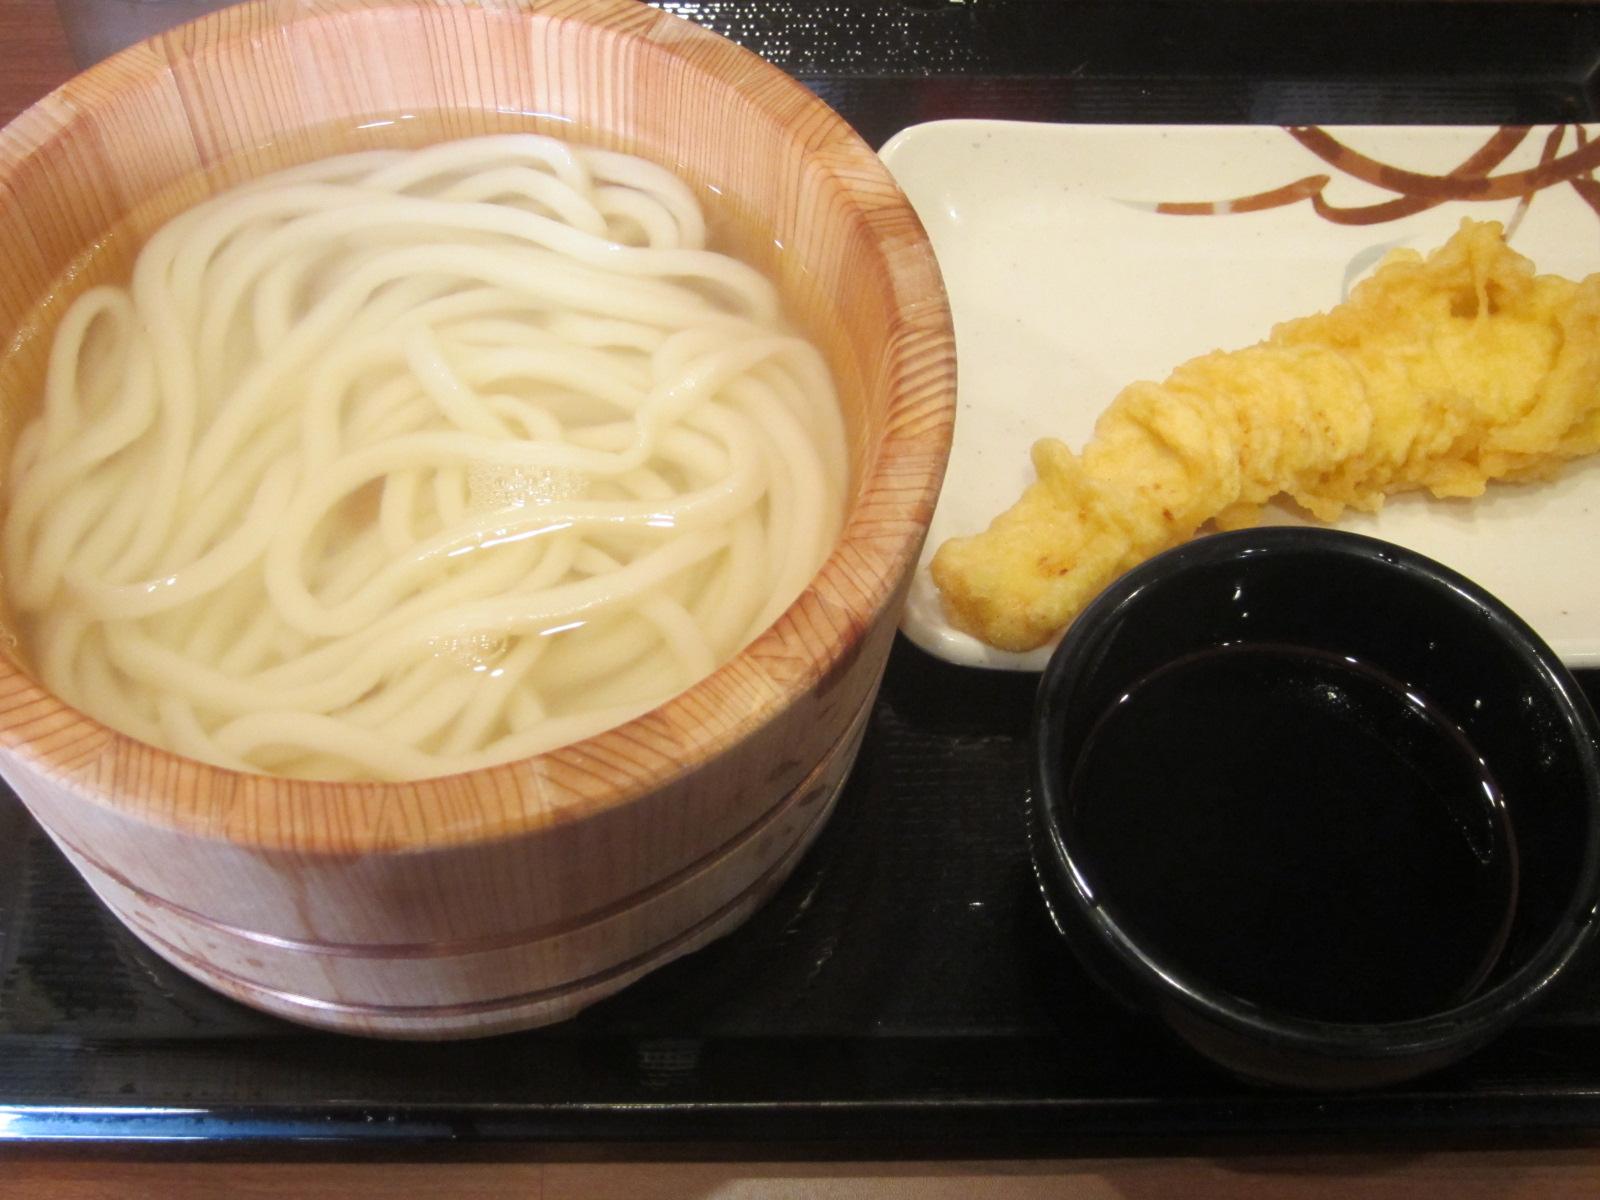 IMG 0002 - 丸亀製麺で釜揚げうどん食べてみた